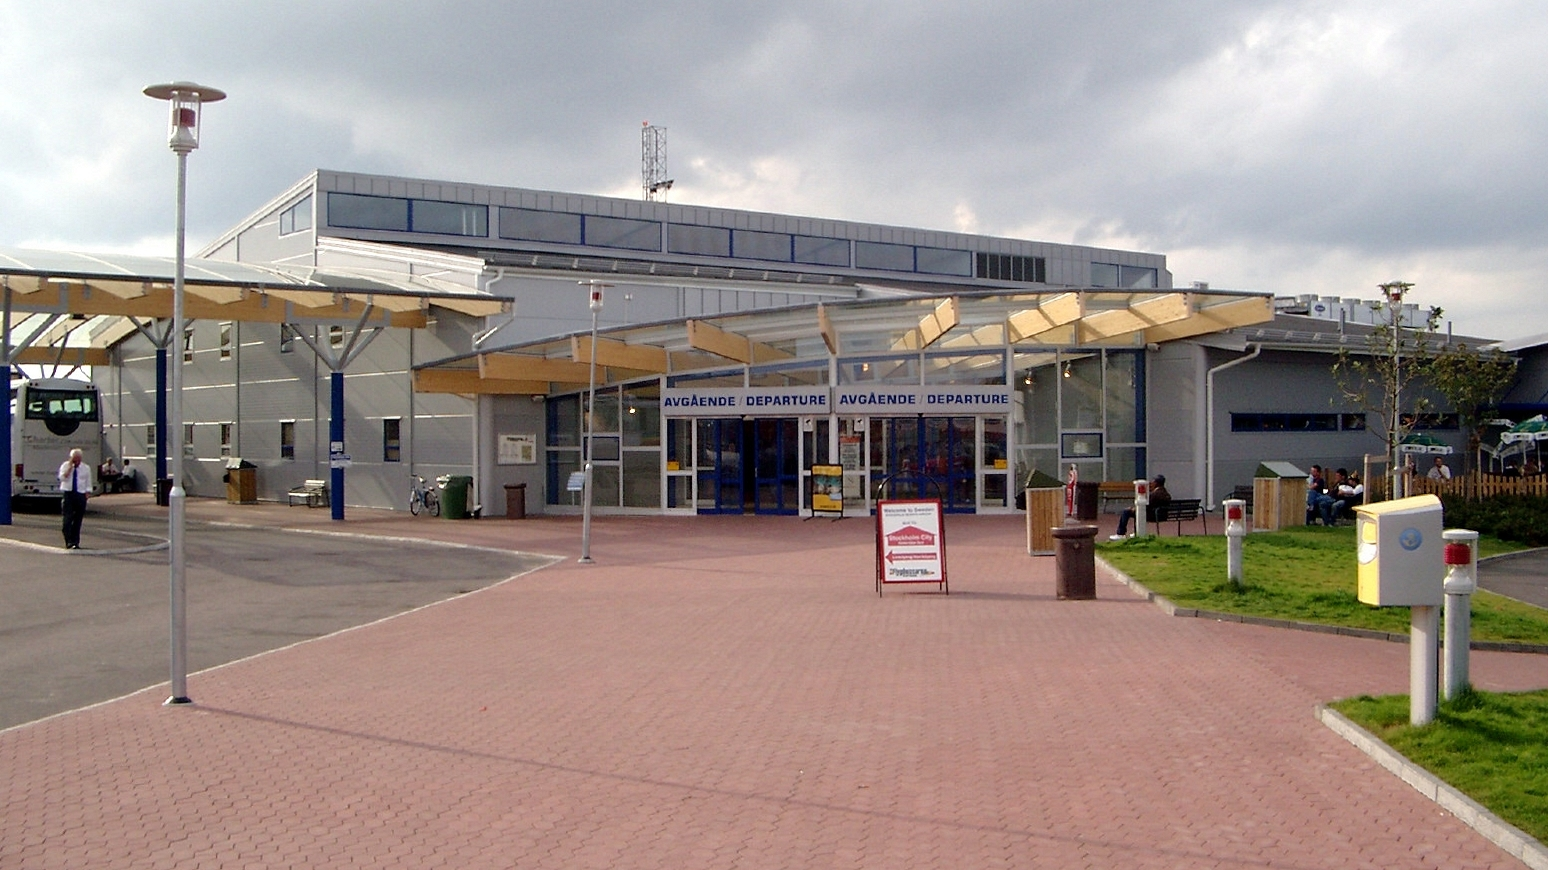 Аэропорт Брюссель Шарлеруа airport Charleroi Bruxelles